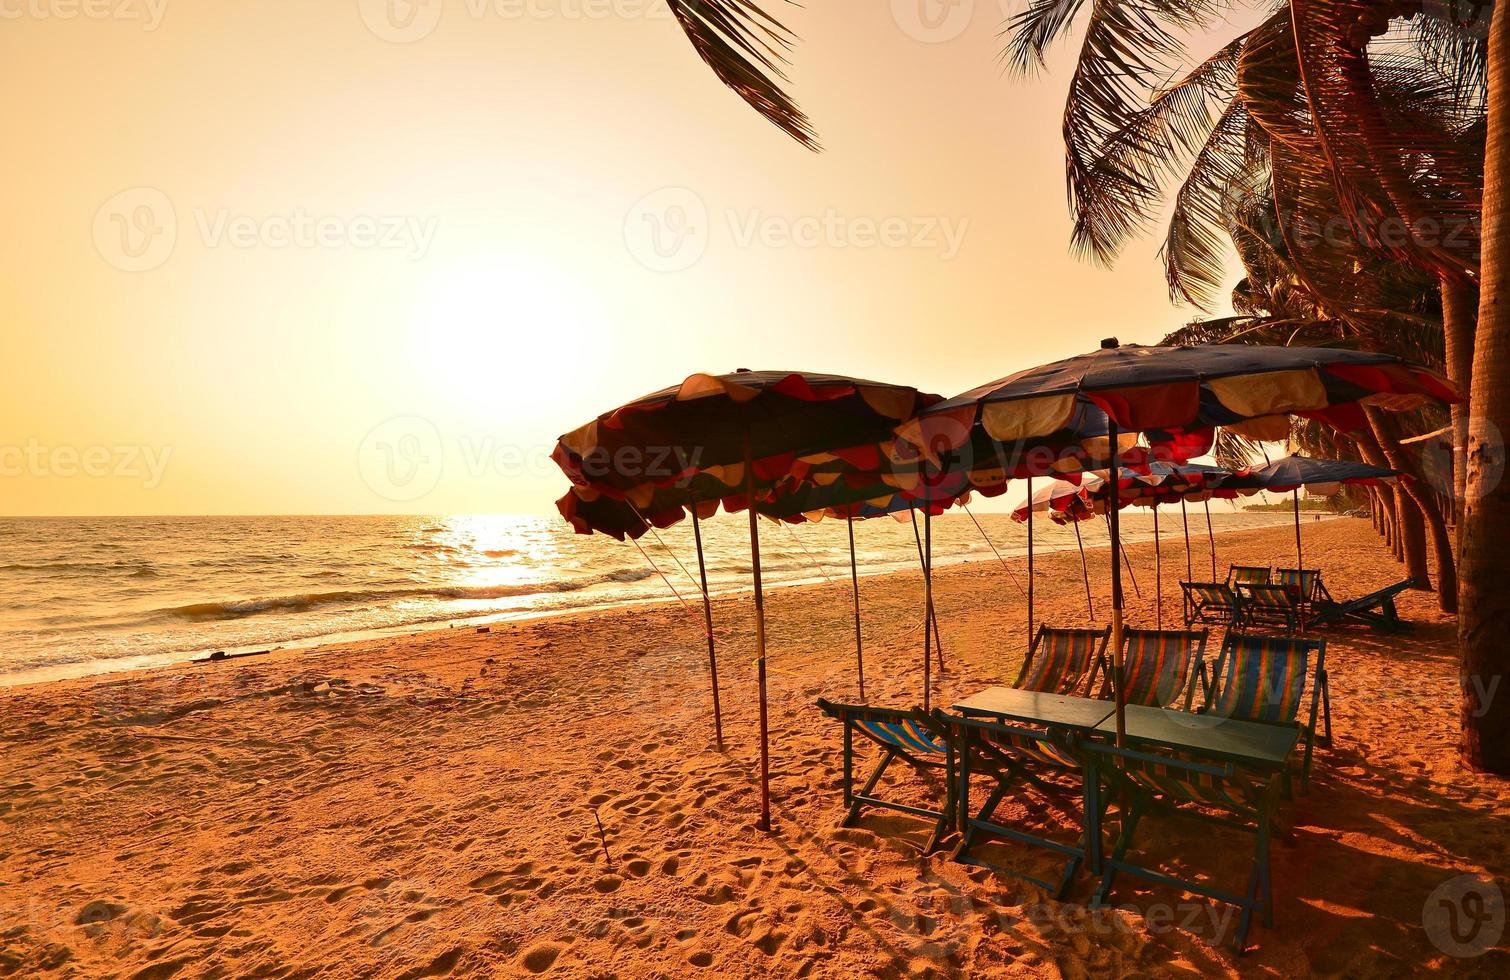 strand vid solnedgång bakgrund foto